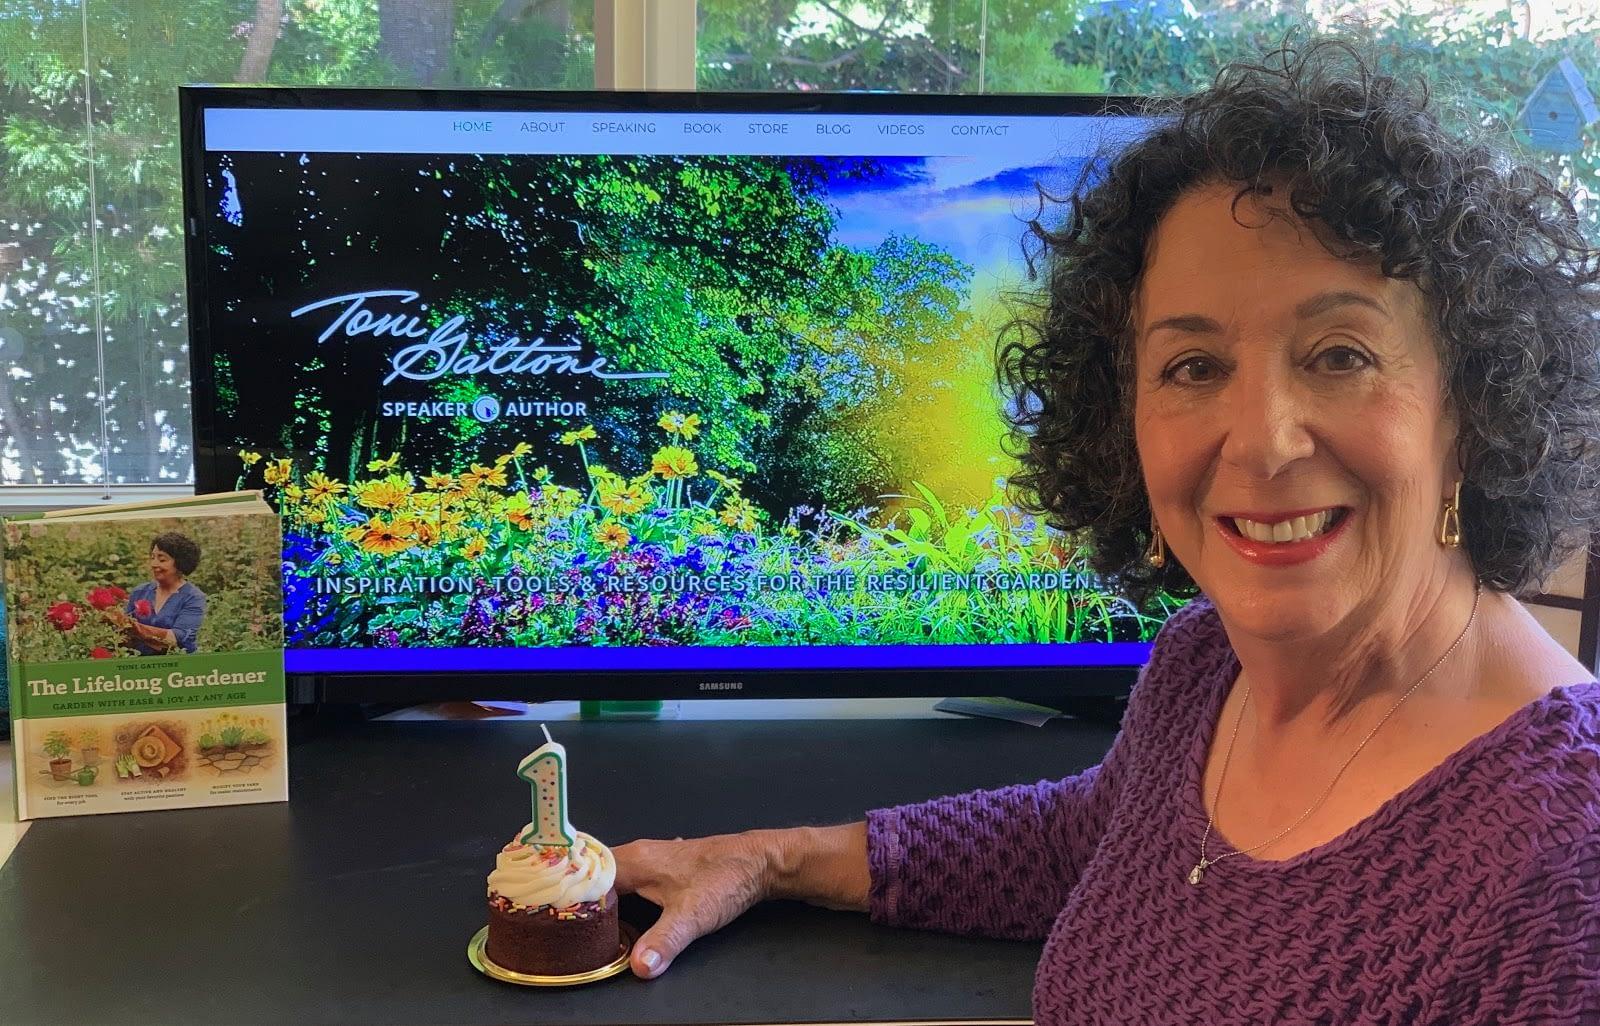 Toni Gattone sit in front of her Award Winning website on a desktop computer